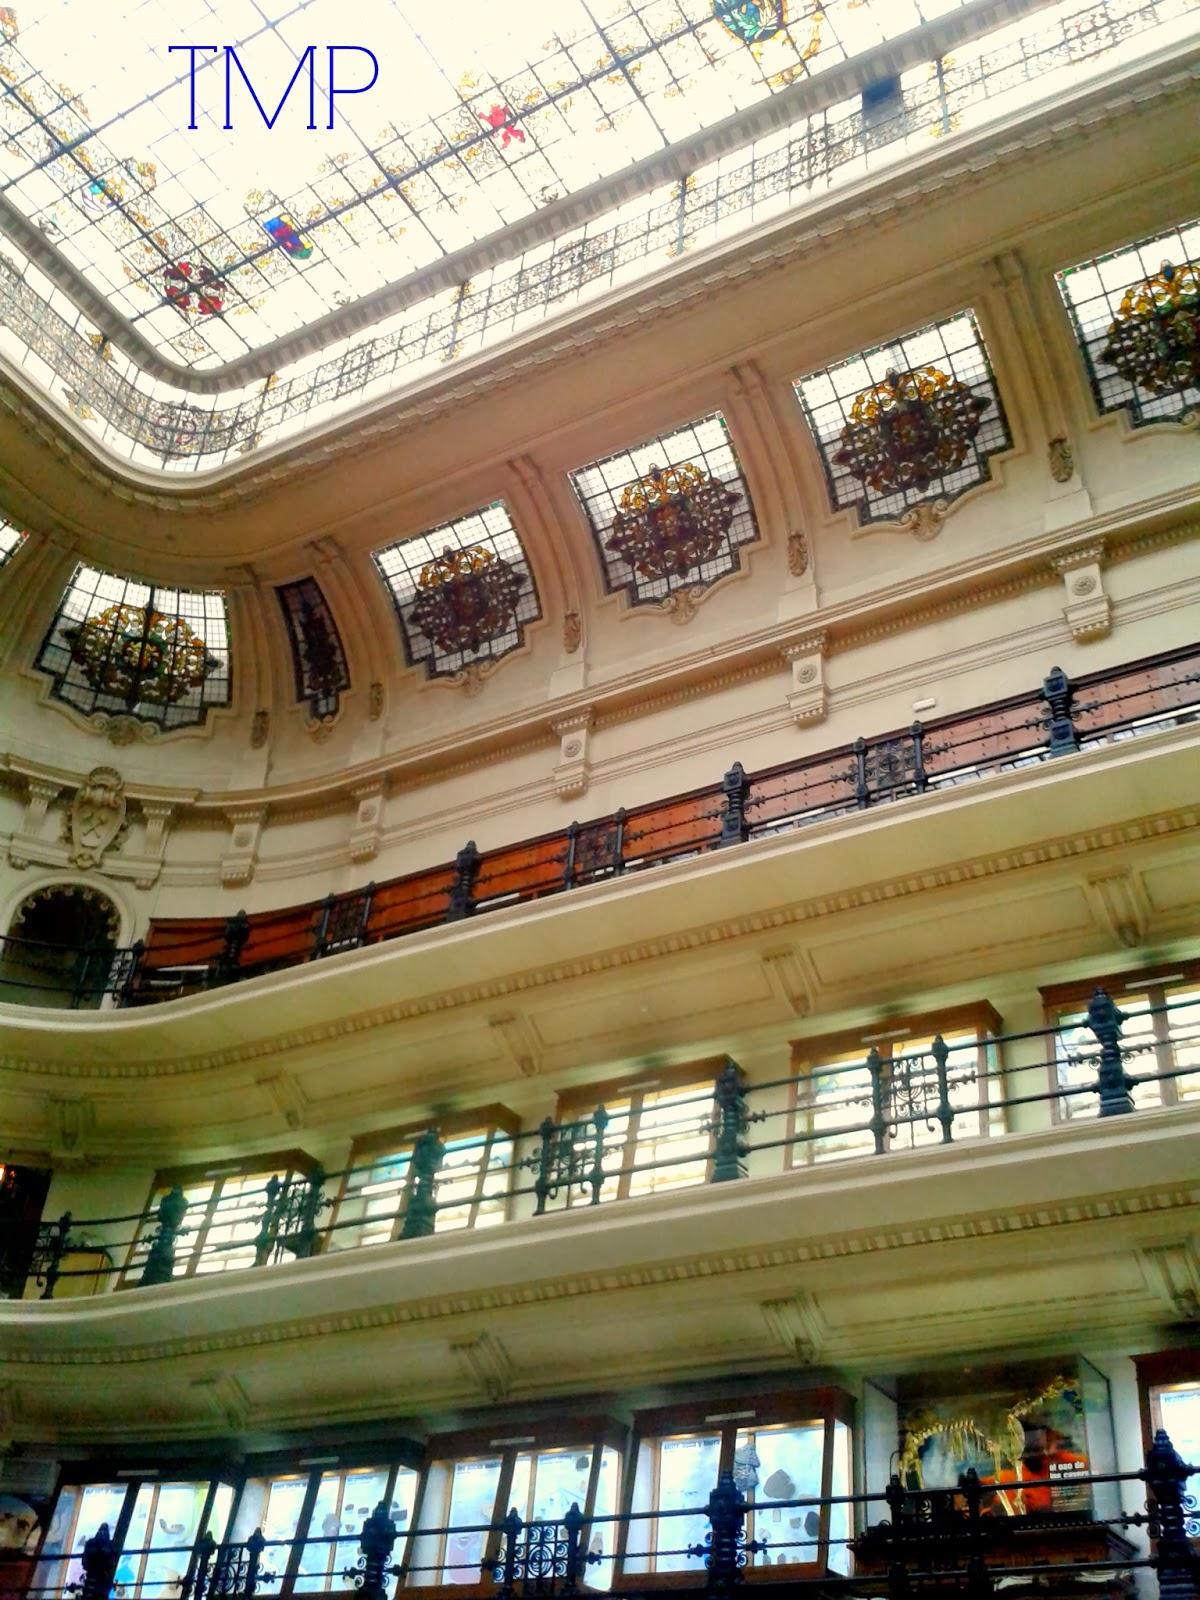 Museos e Historias para Vivir en Familia 7